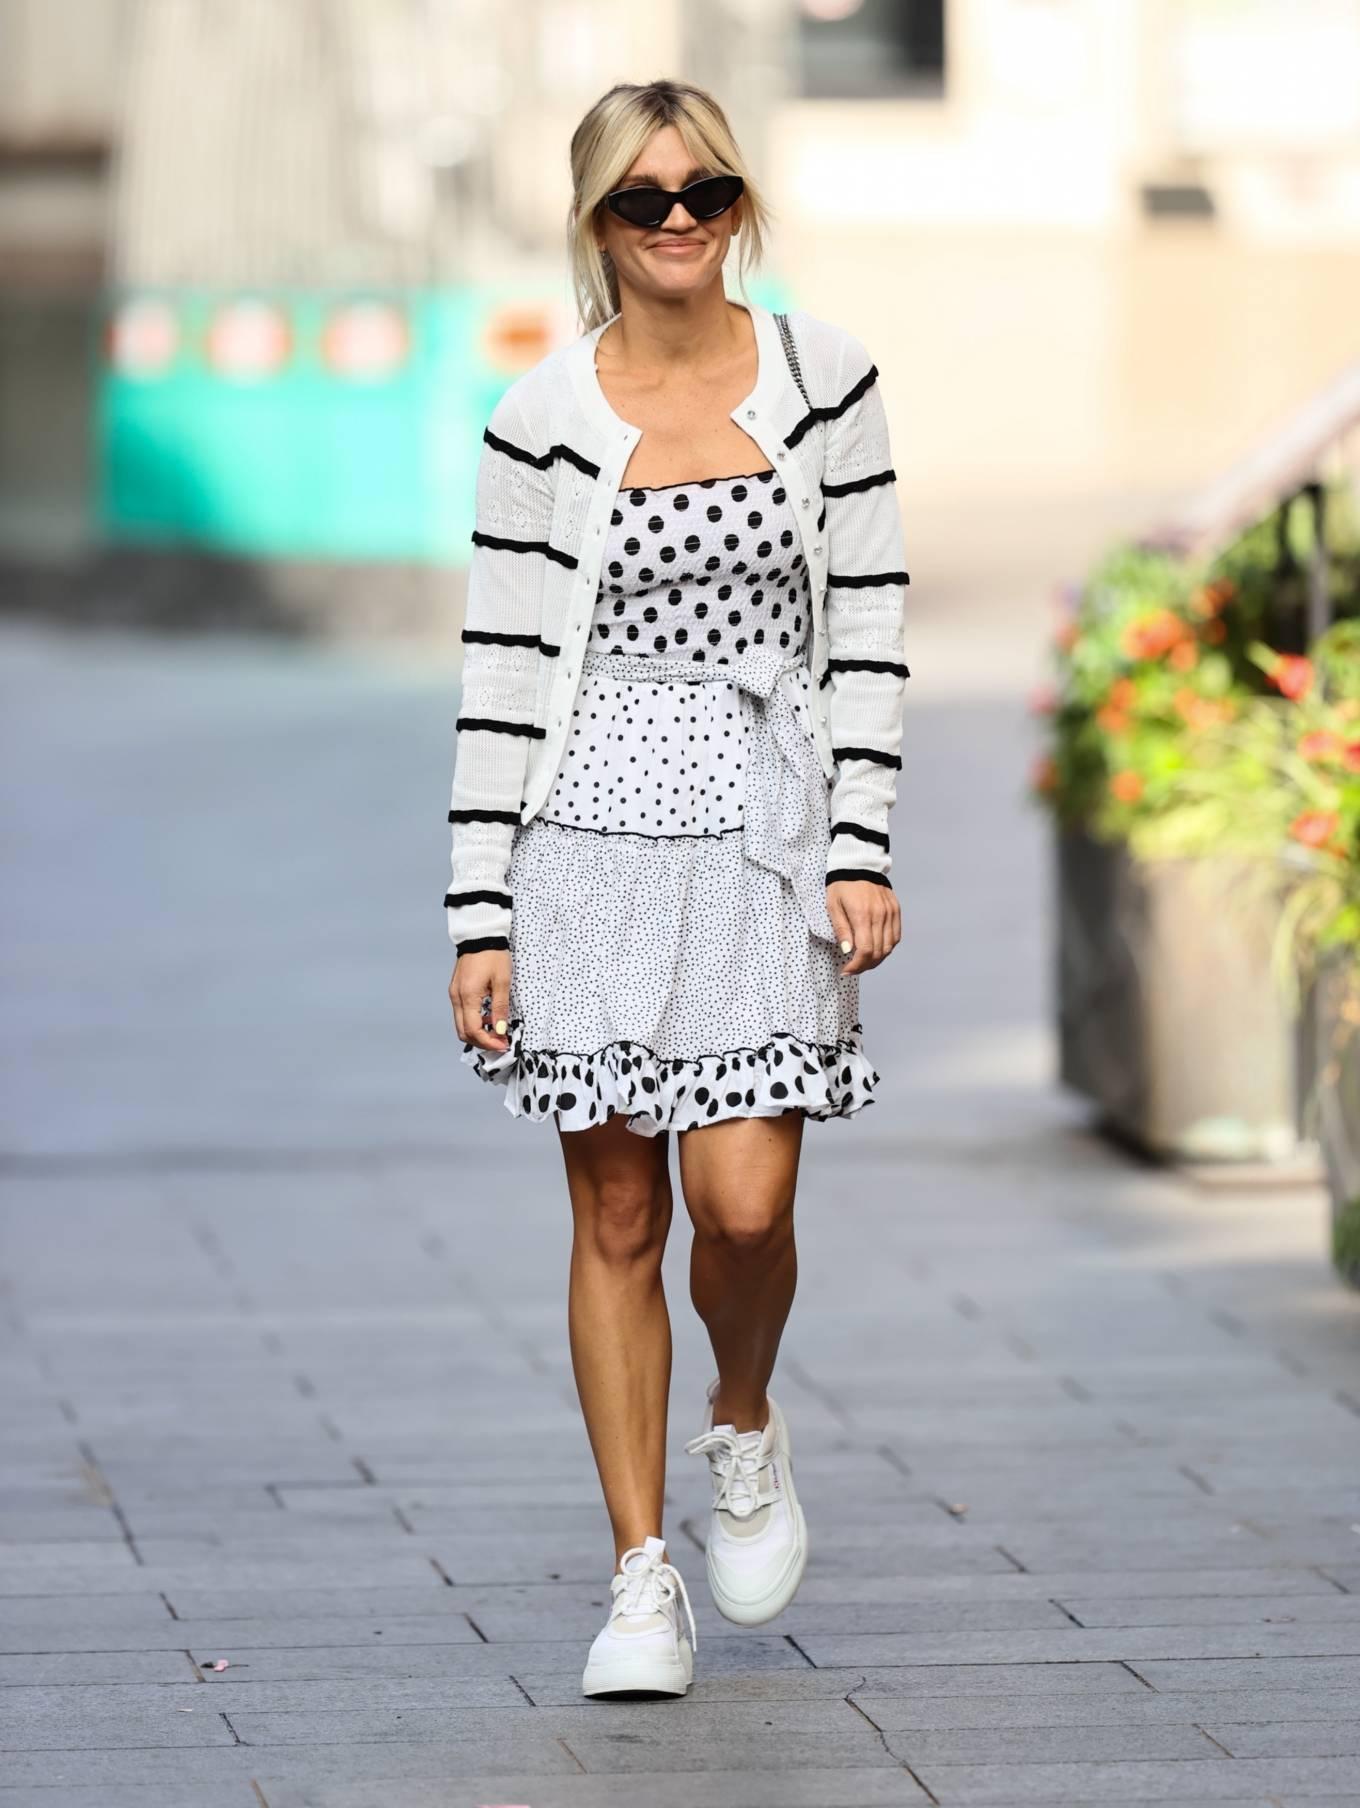 Ashley Roberts 2020 : Ashley Roberts – Wears White Polka Dot dress in London-08